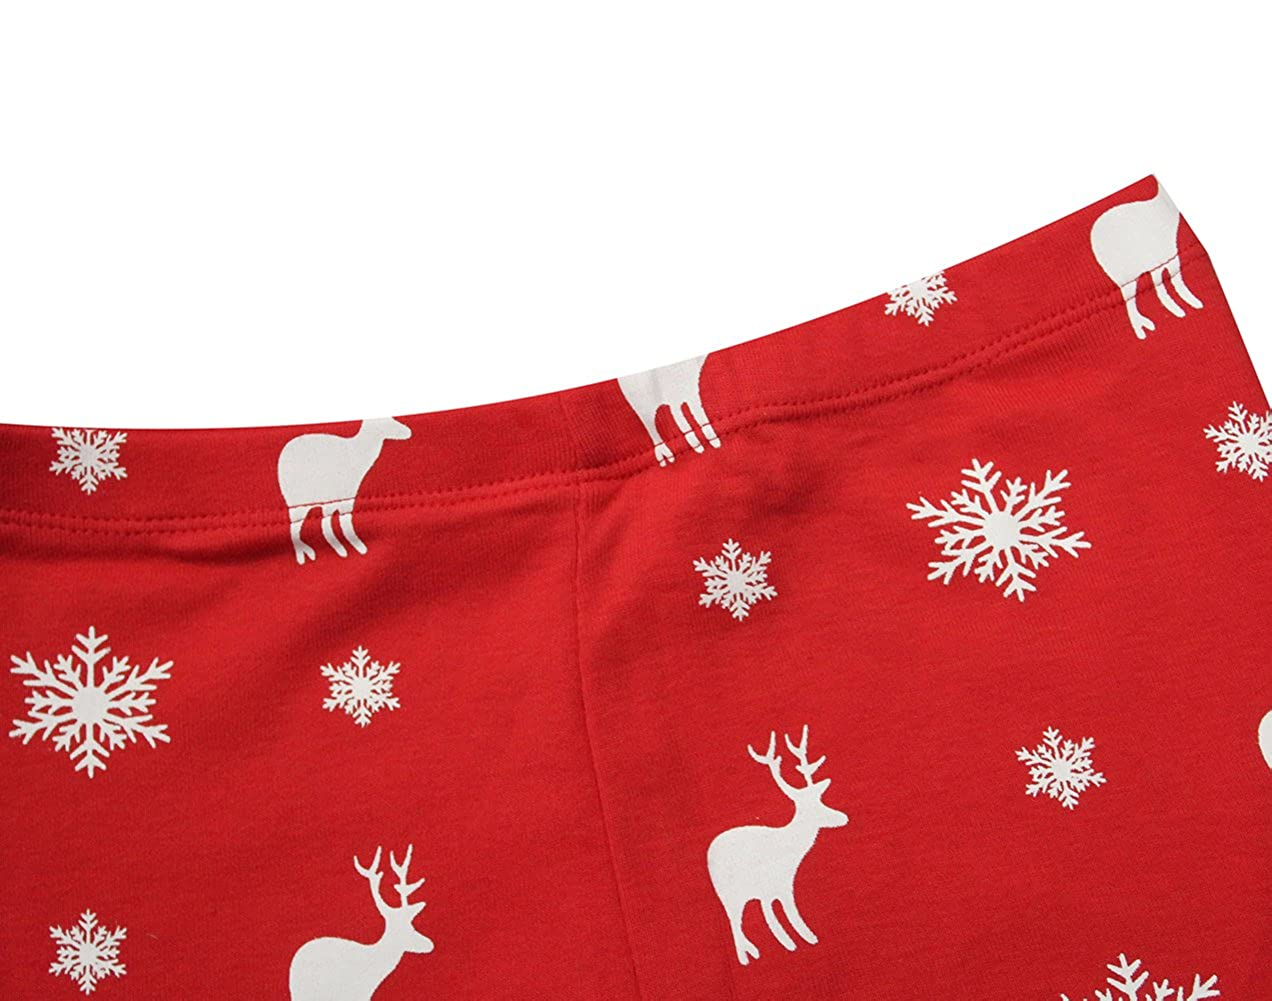 TinaLuLing Merry Christmas Baby Girls Pajamas Sets Kids Christmas Pajamas Red Xmas Pyjamas